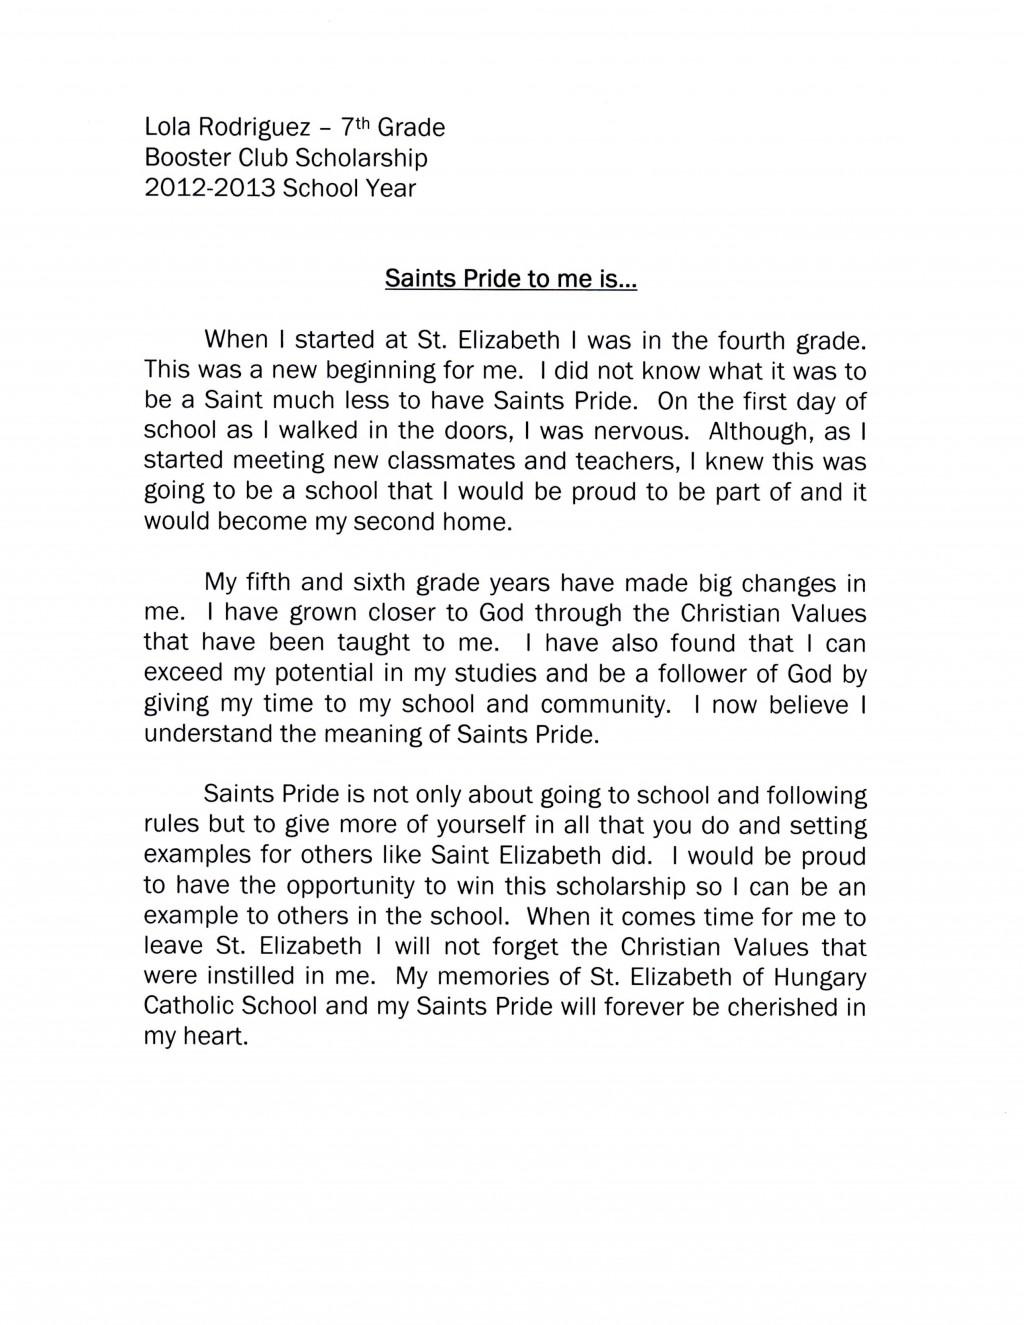 004 National Junior Honor Society Essay Samples Lola Rodriguez Unusual Large